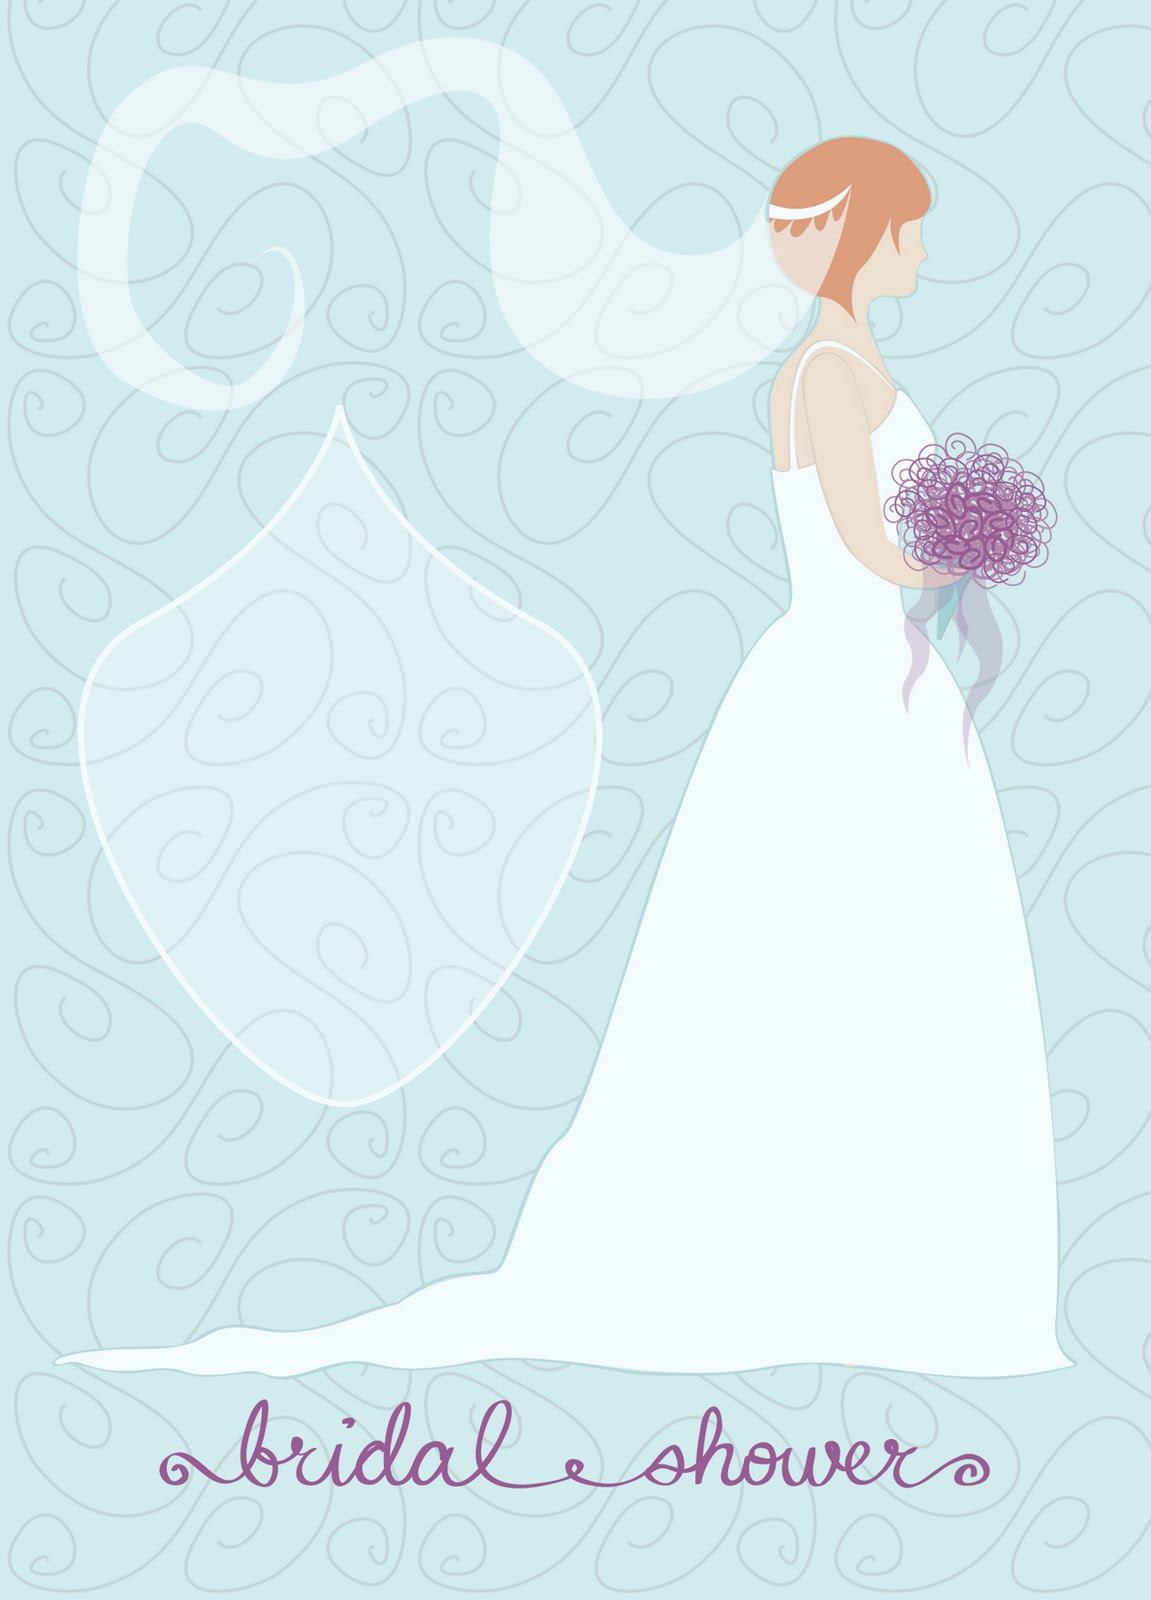 Tiffany39;s World of Creativity: Bridal Shower Invitation